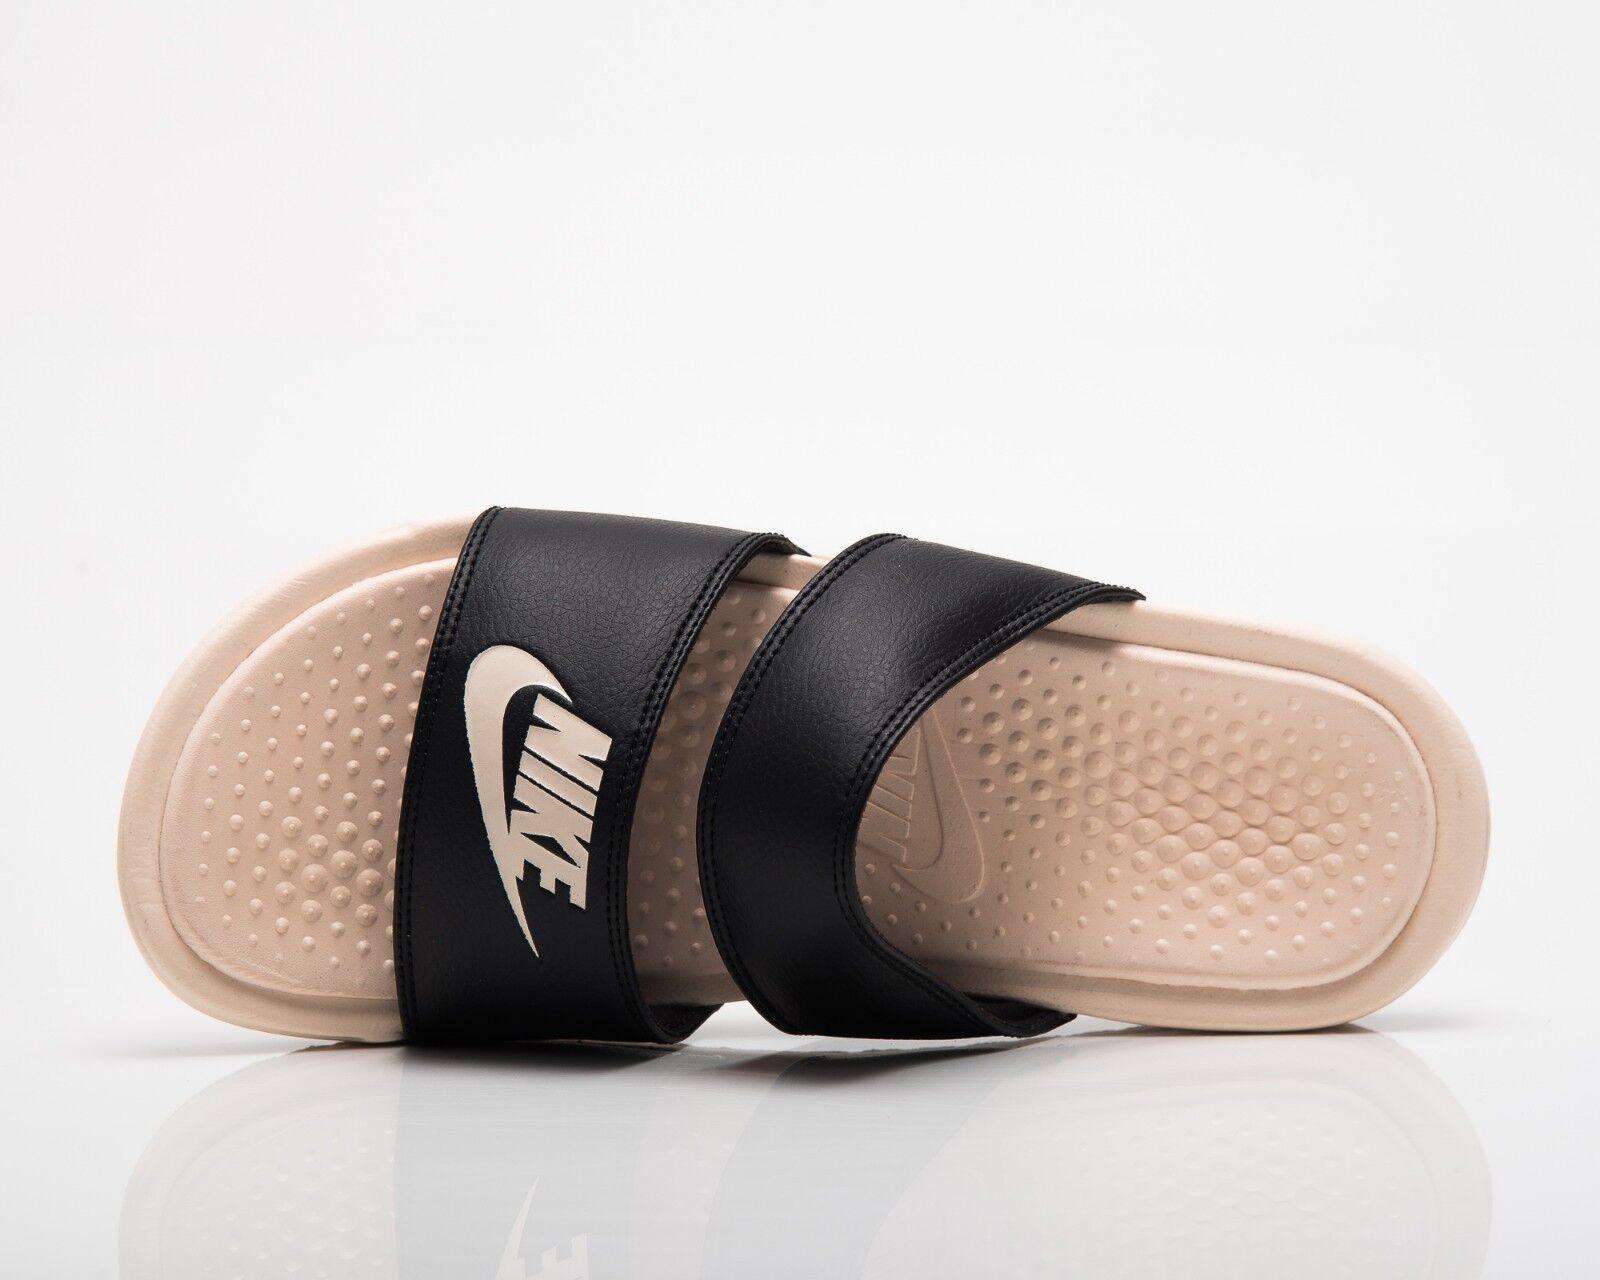 De Flip Sandalias Flop Mujer Chancla Hebilla Nike Deslizante Duo 4Hf6wxqB